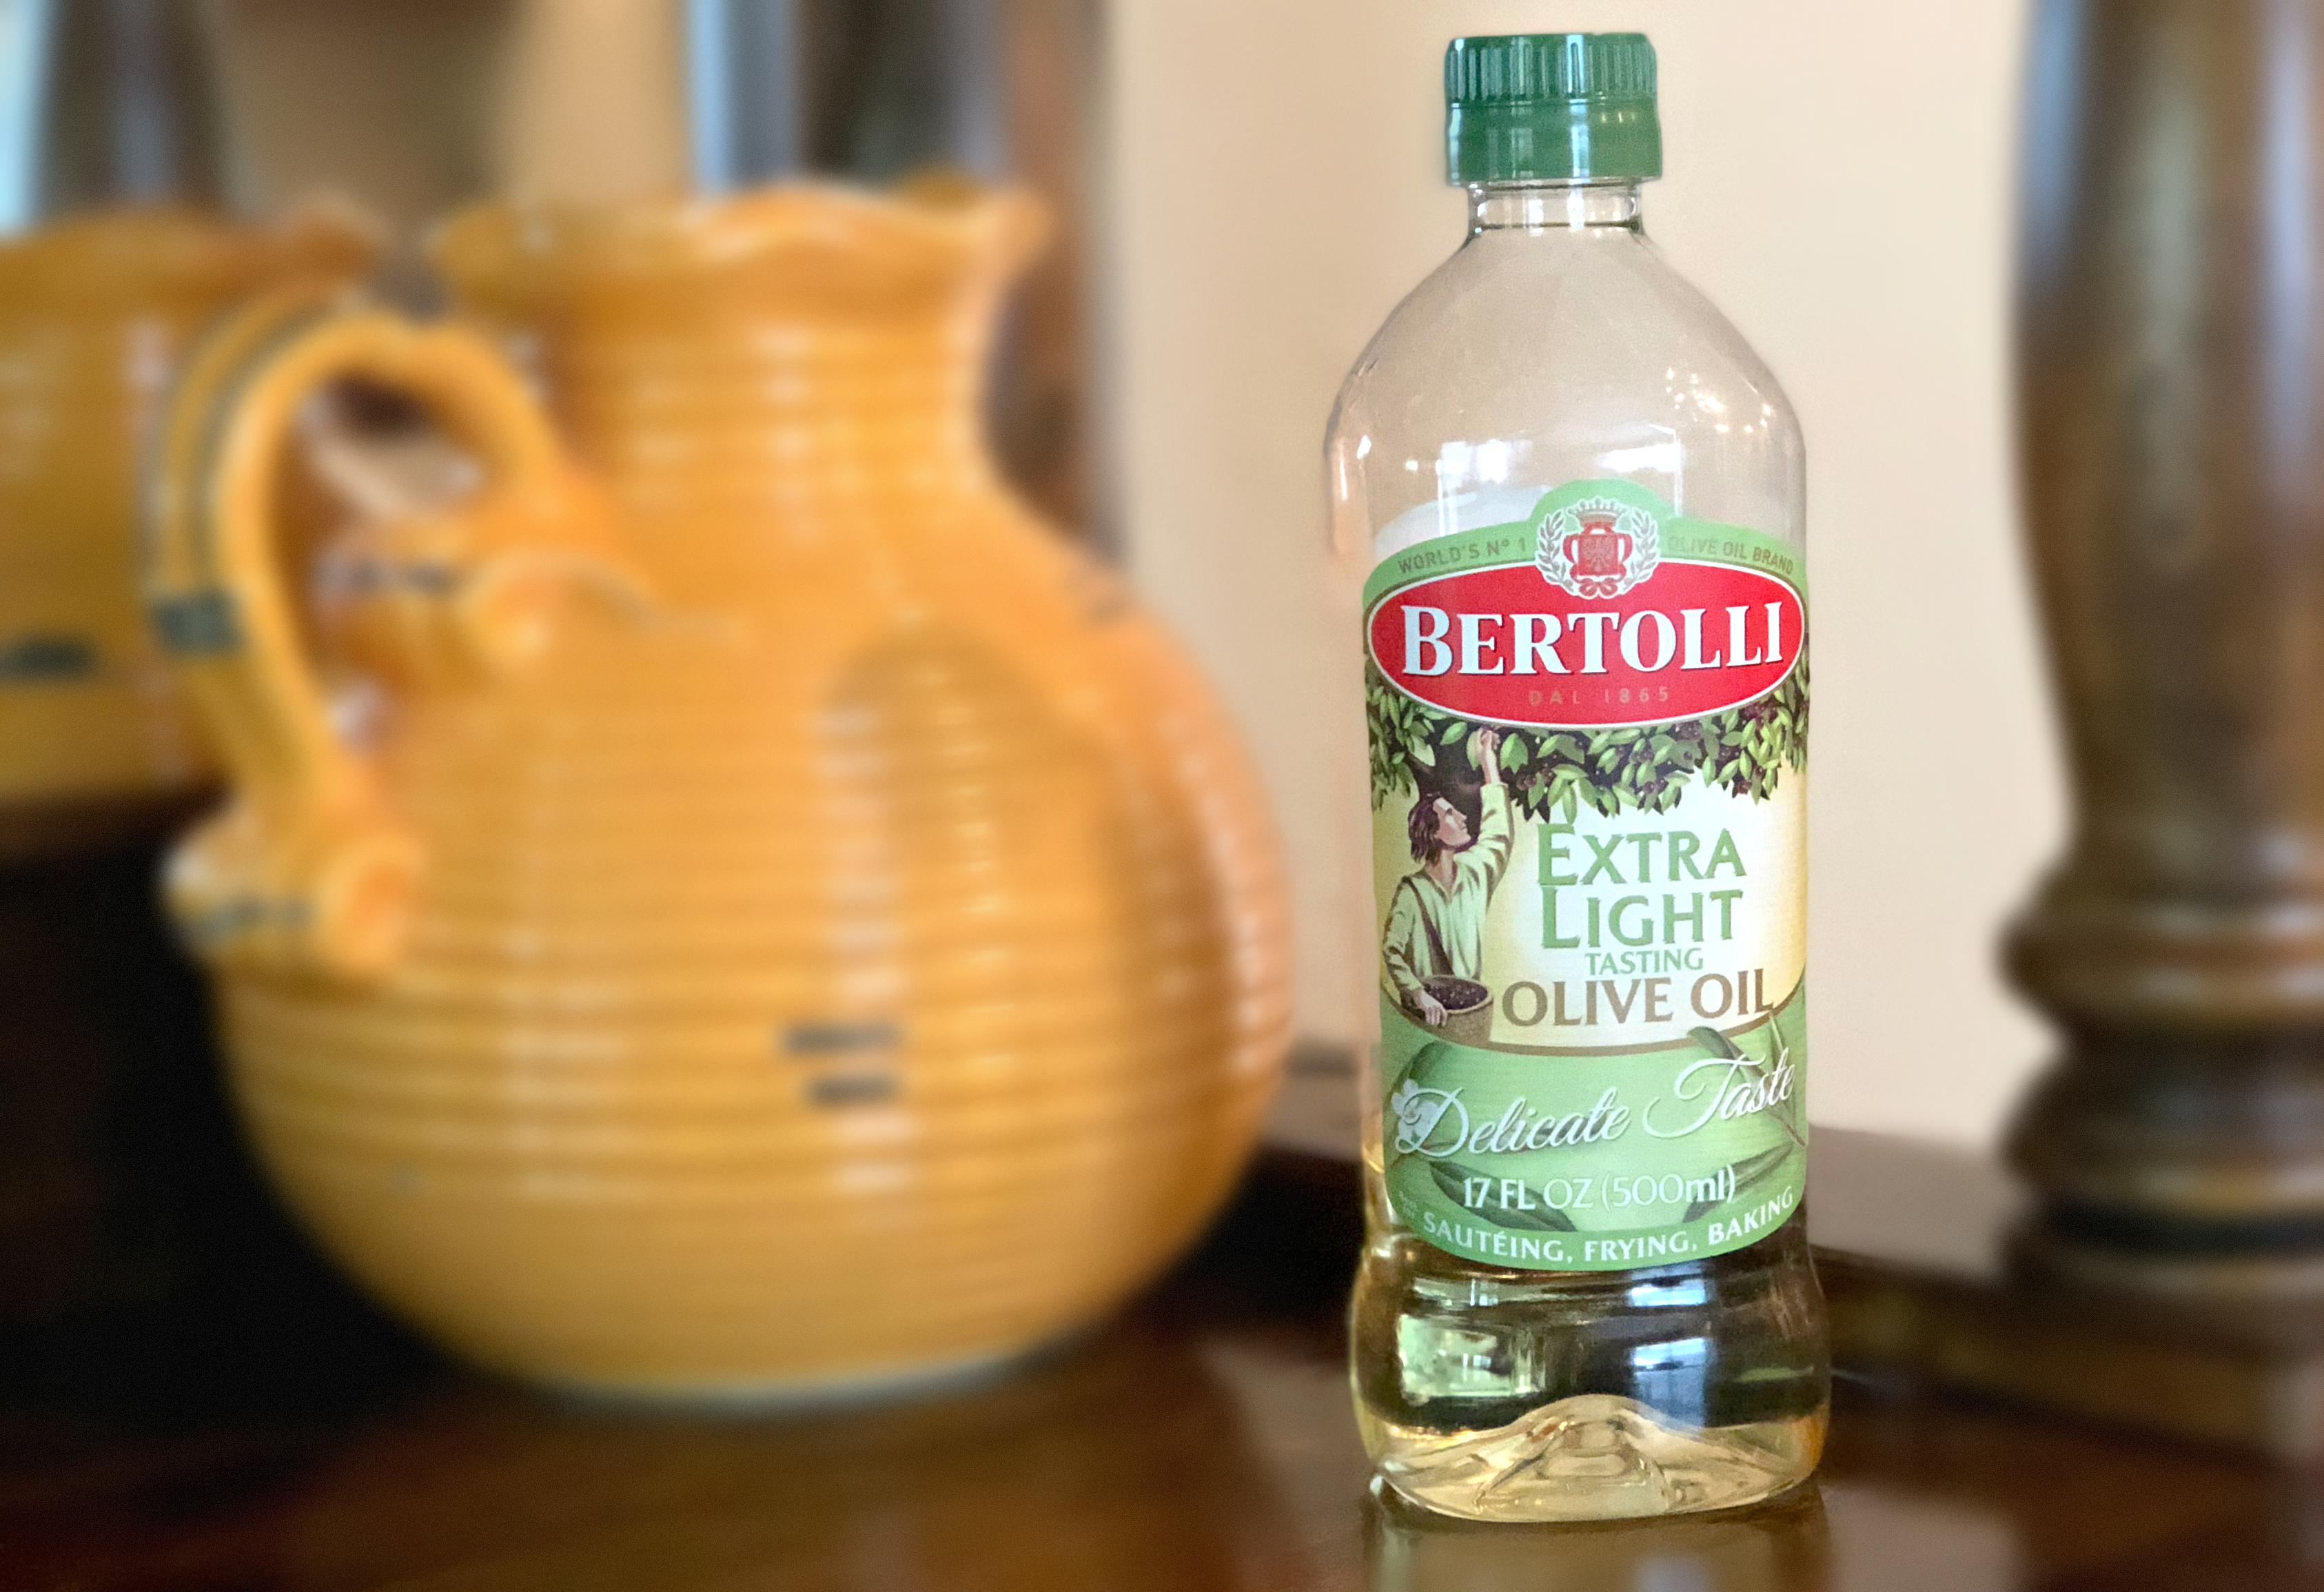 Bertolli Extra Light Tasting olive oil next to an earthenware jug